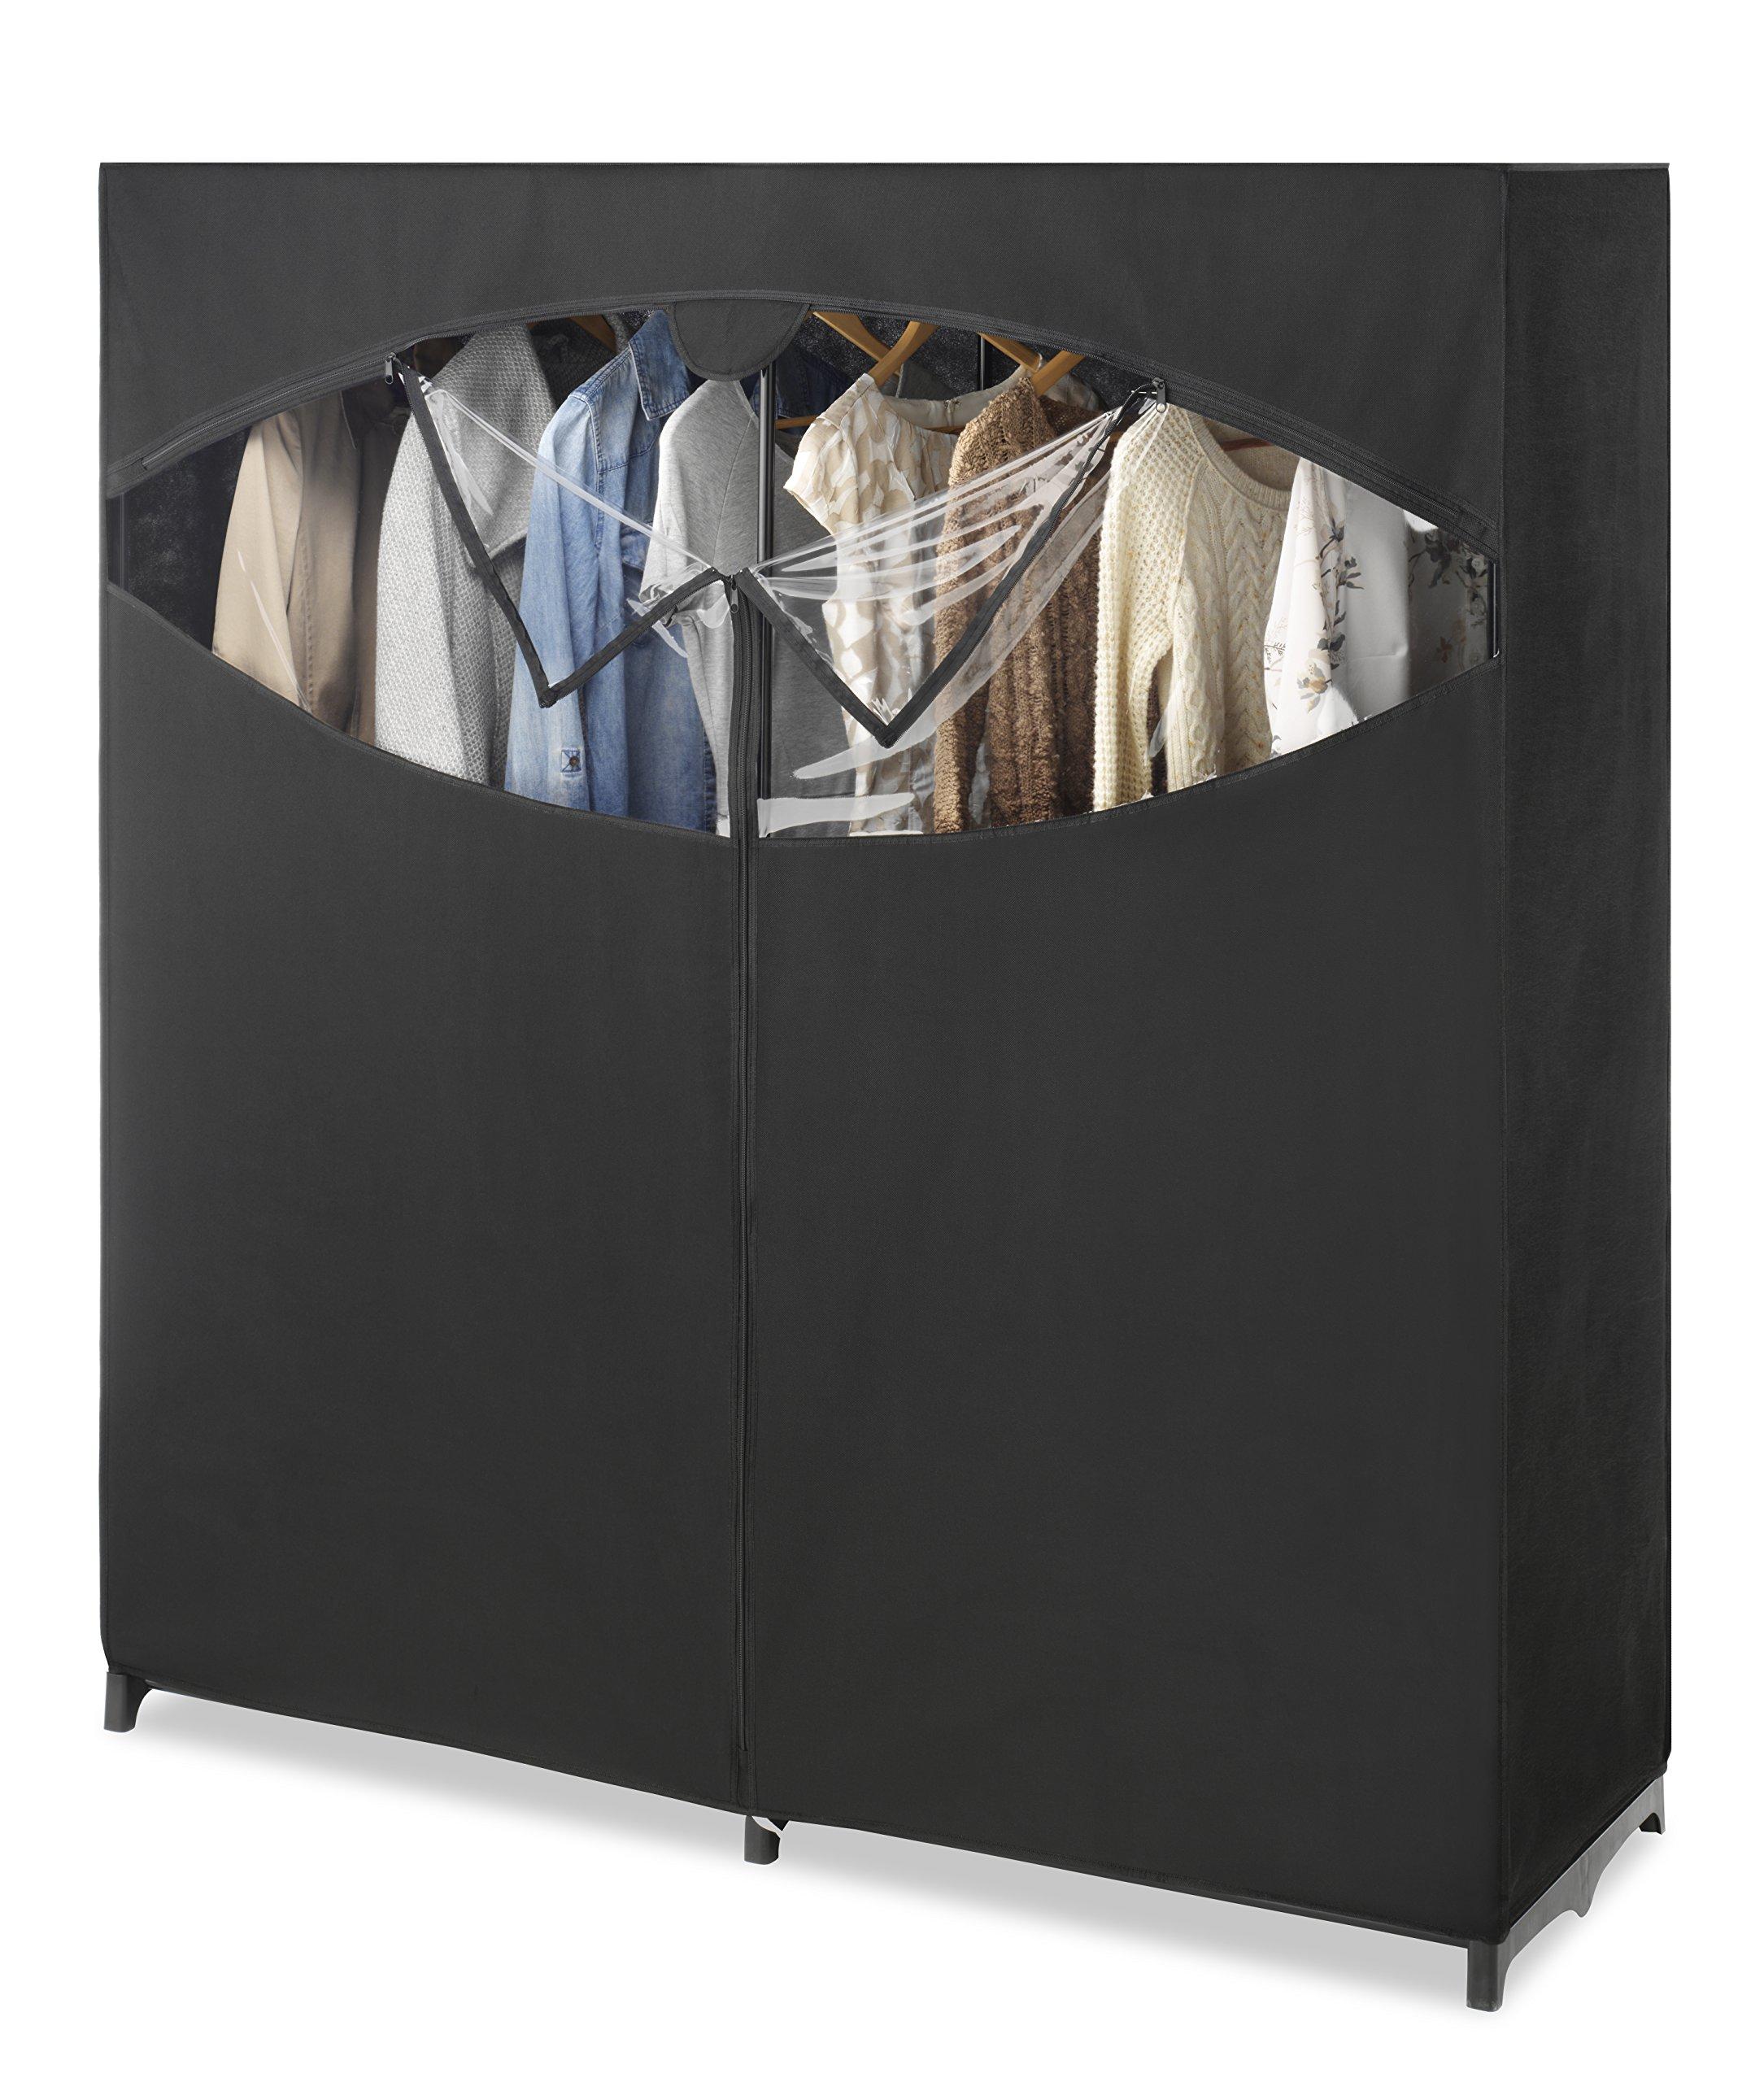 Whitmor Portable Wardrobe Clothes Organizer